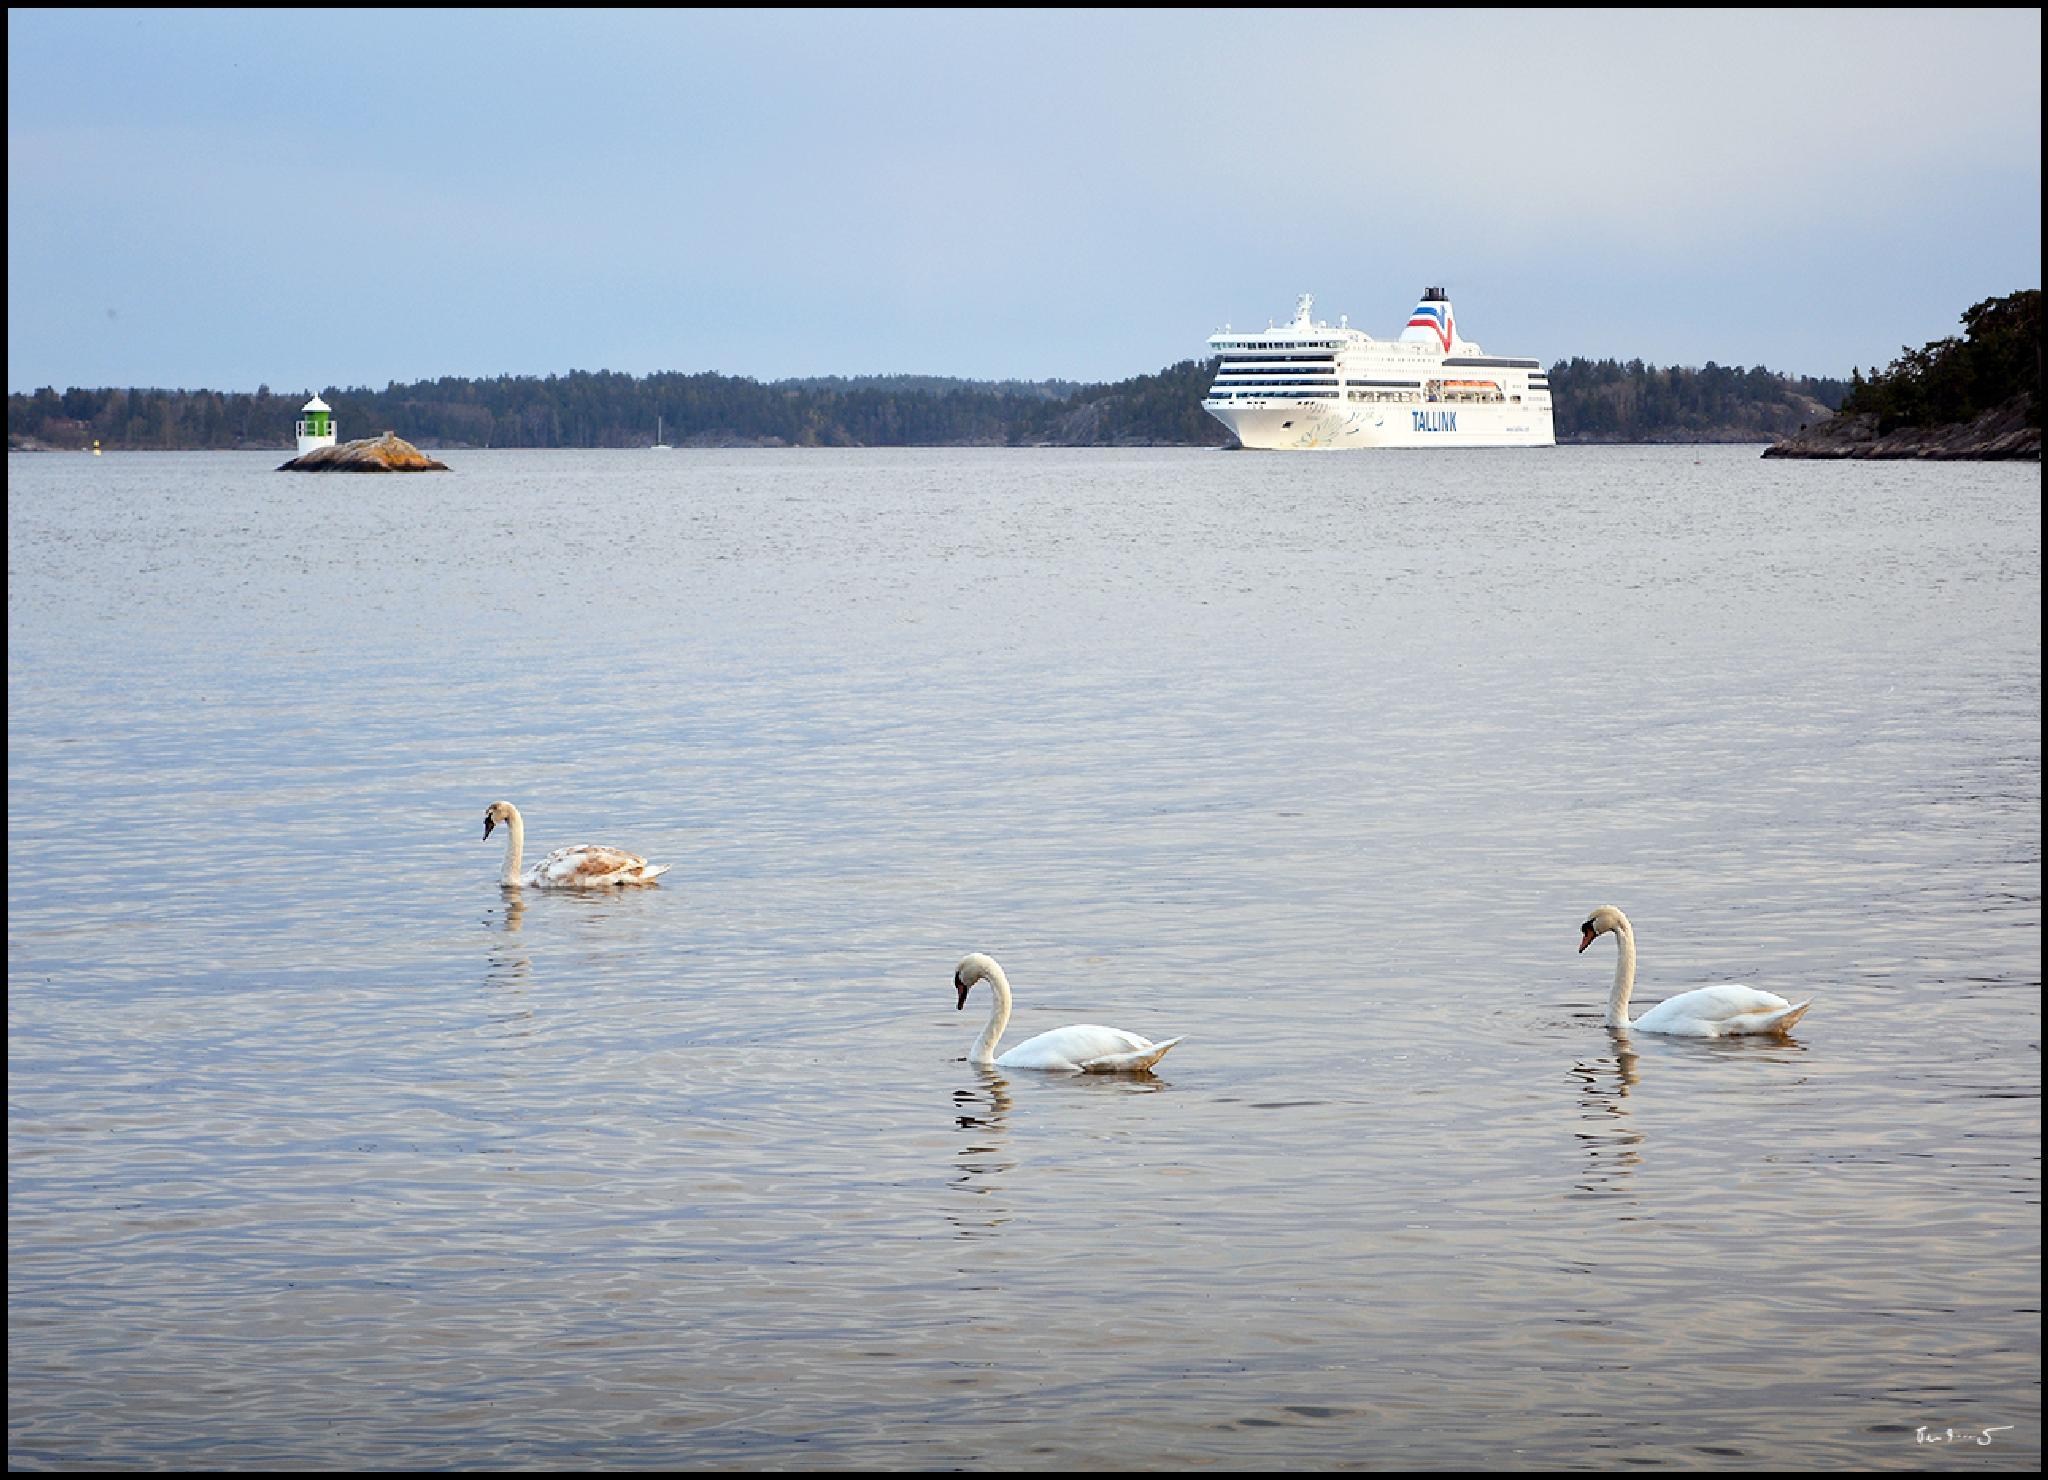 Formation greeting a ferry by Per Arnesjö